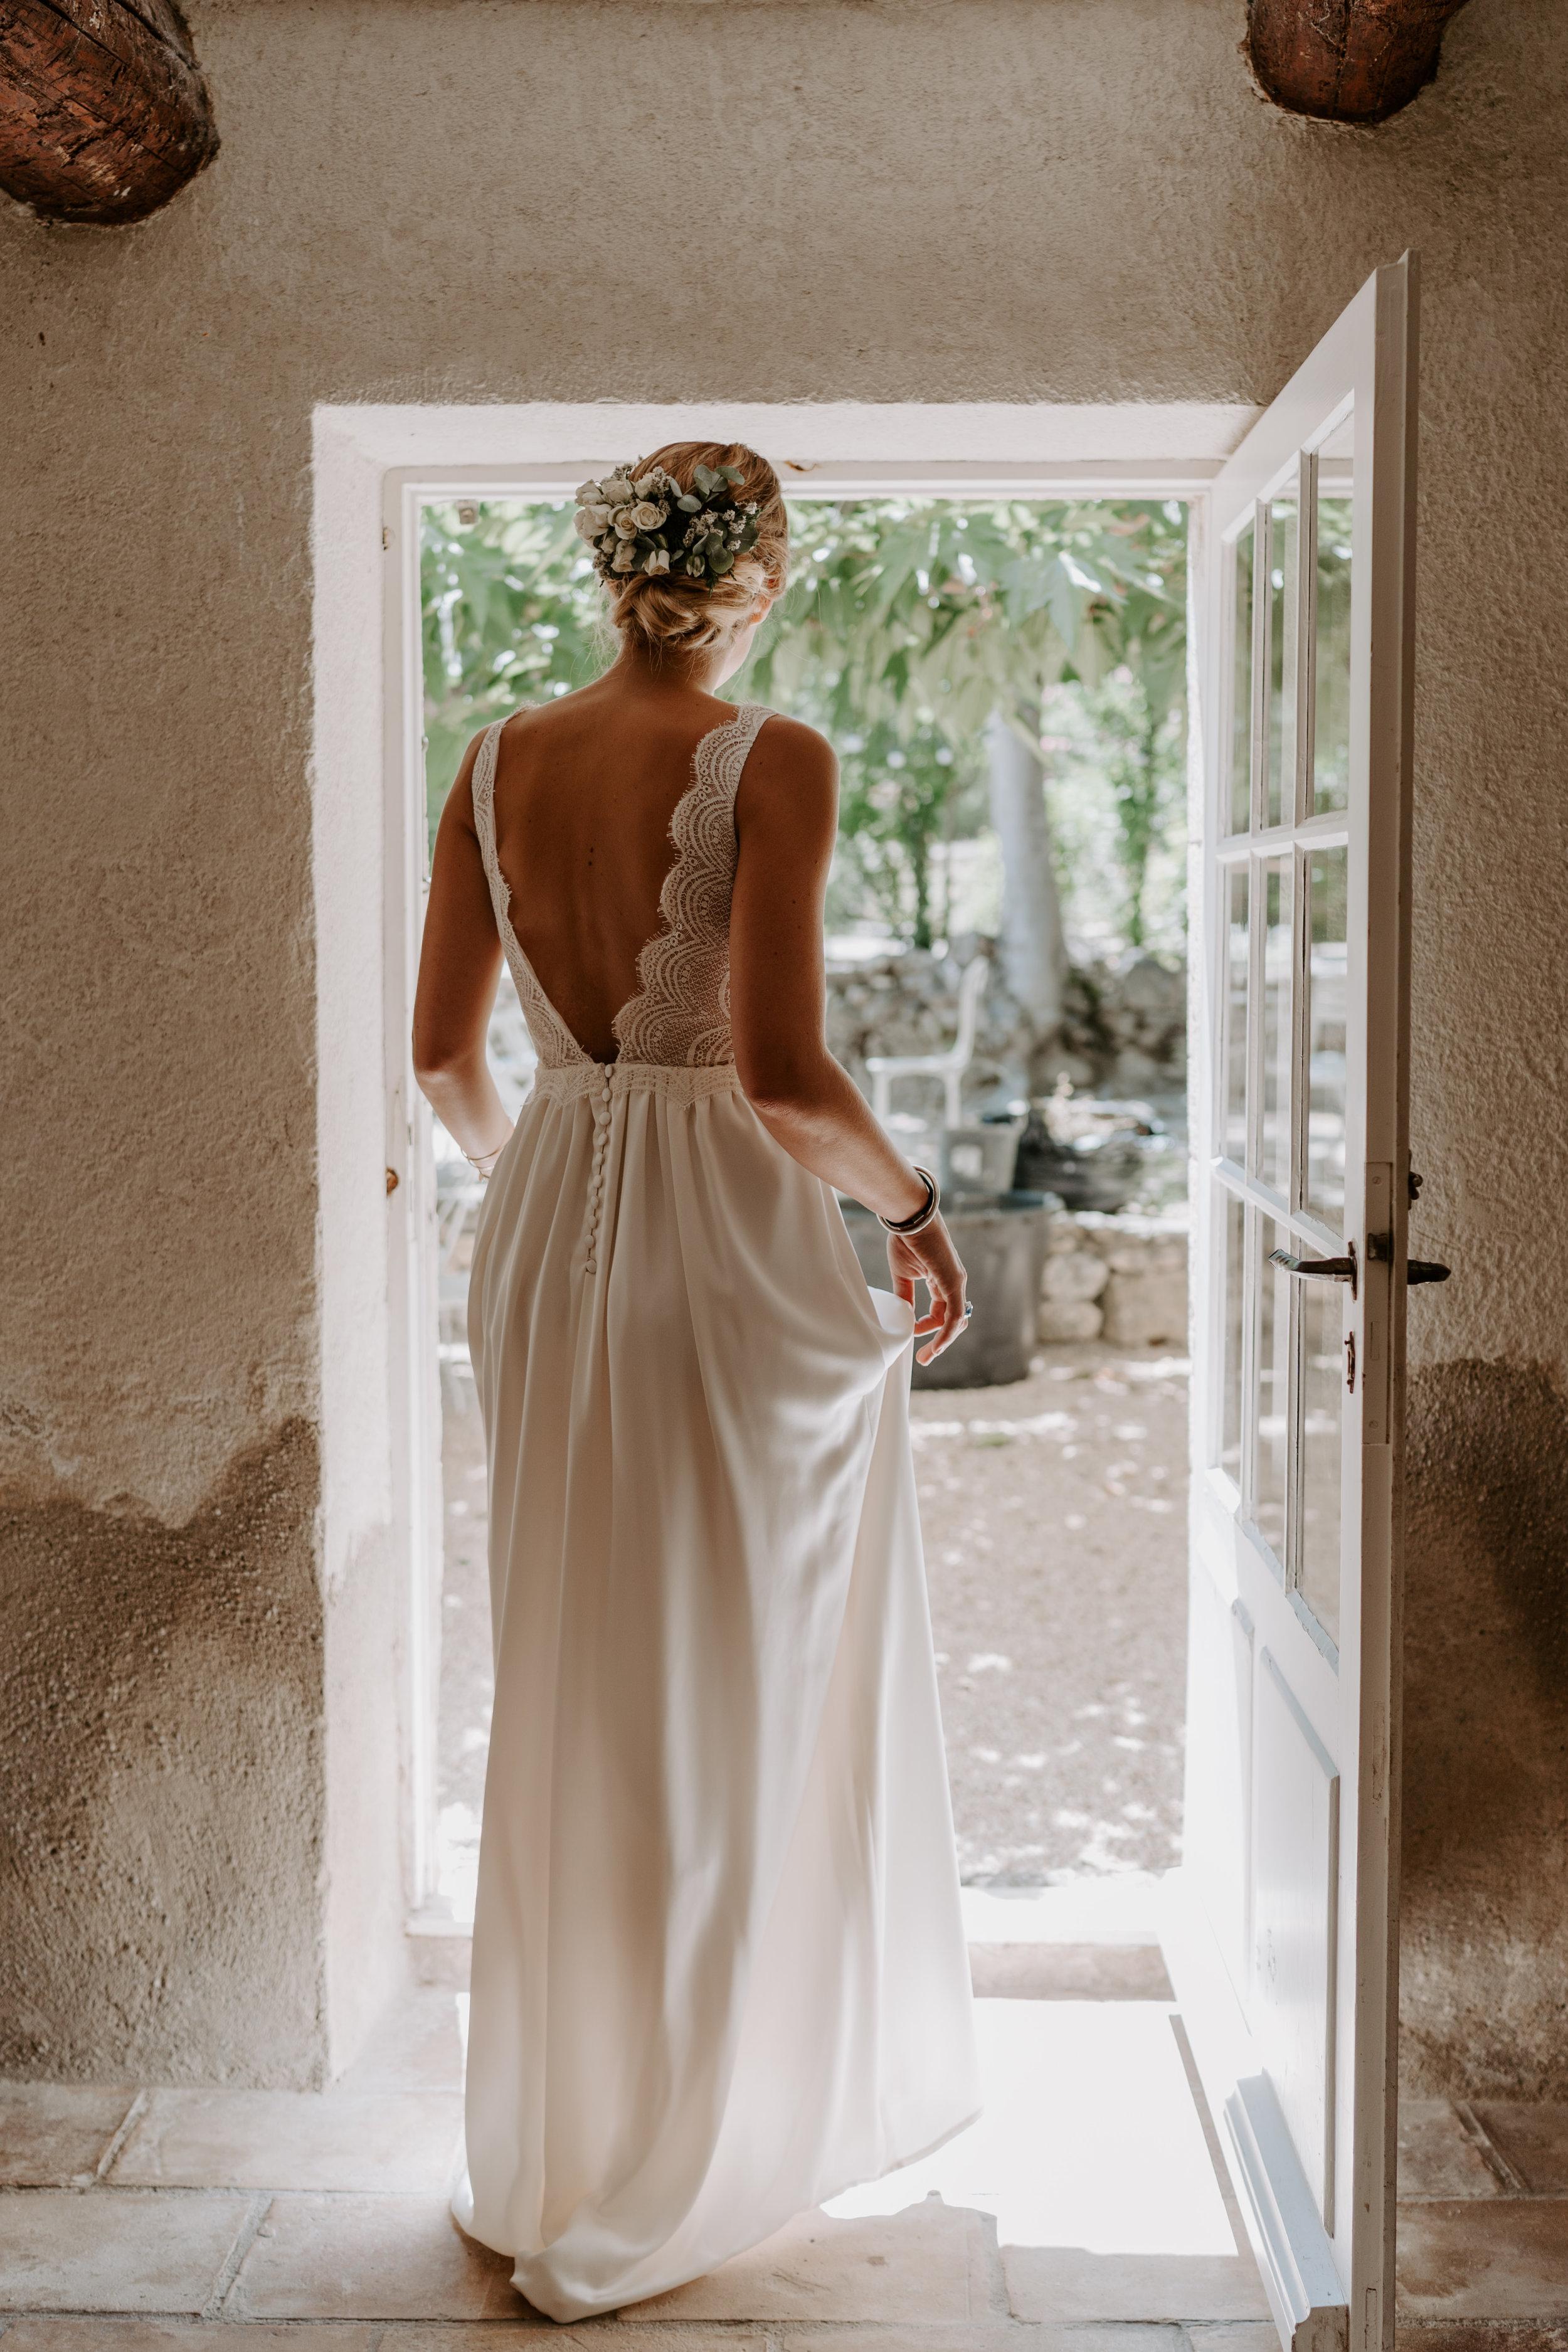 elsacaza_photographe_mariage_Juliette_Nicolas-63.jpg